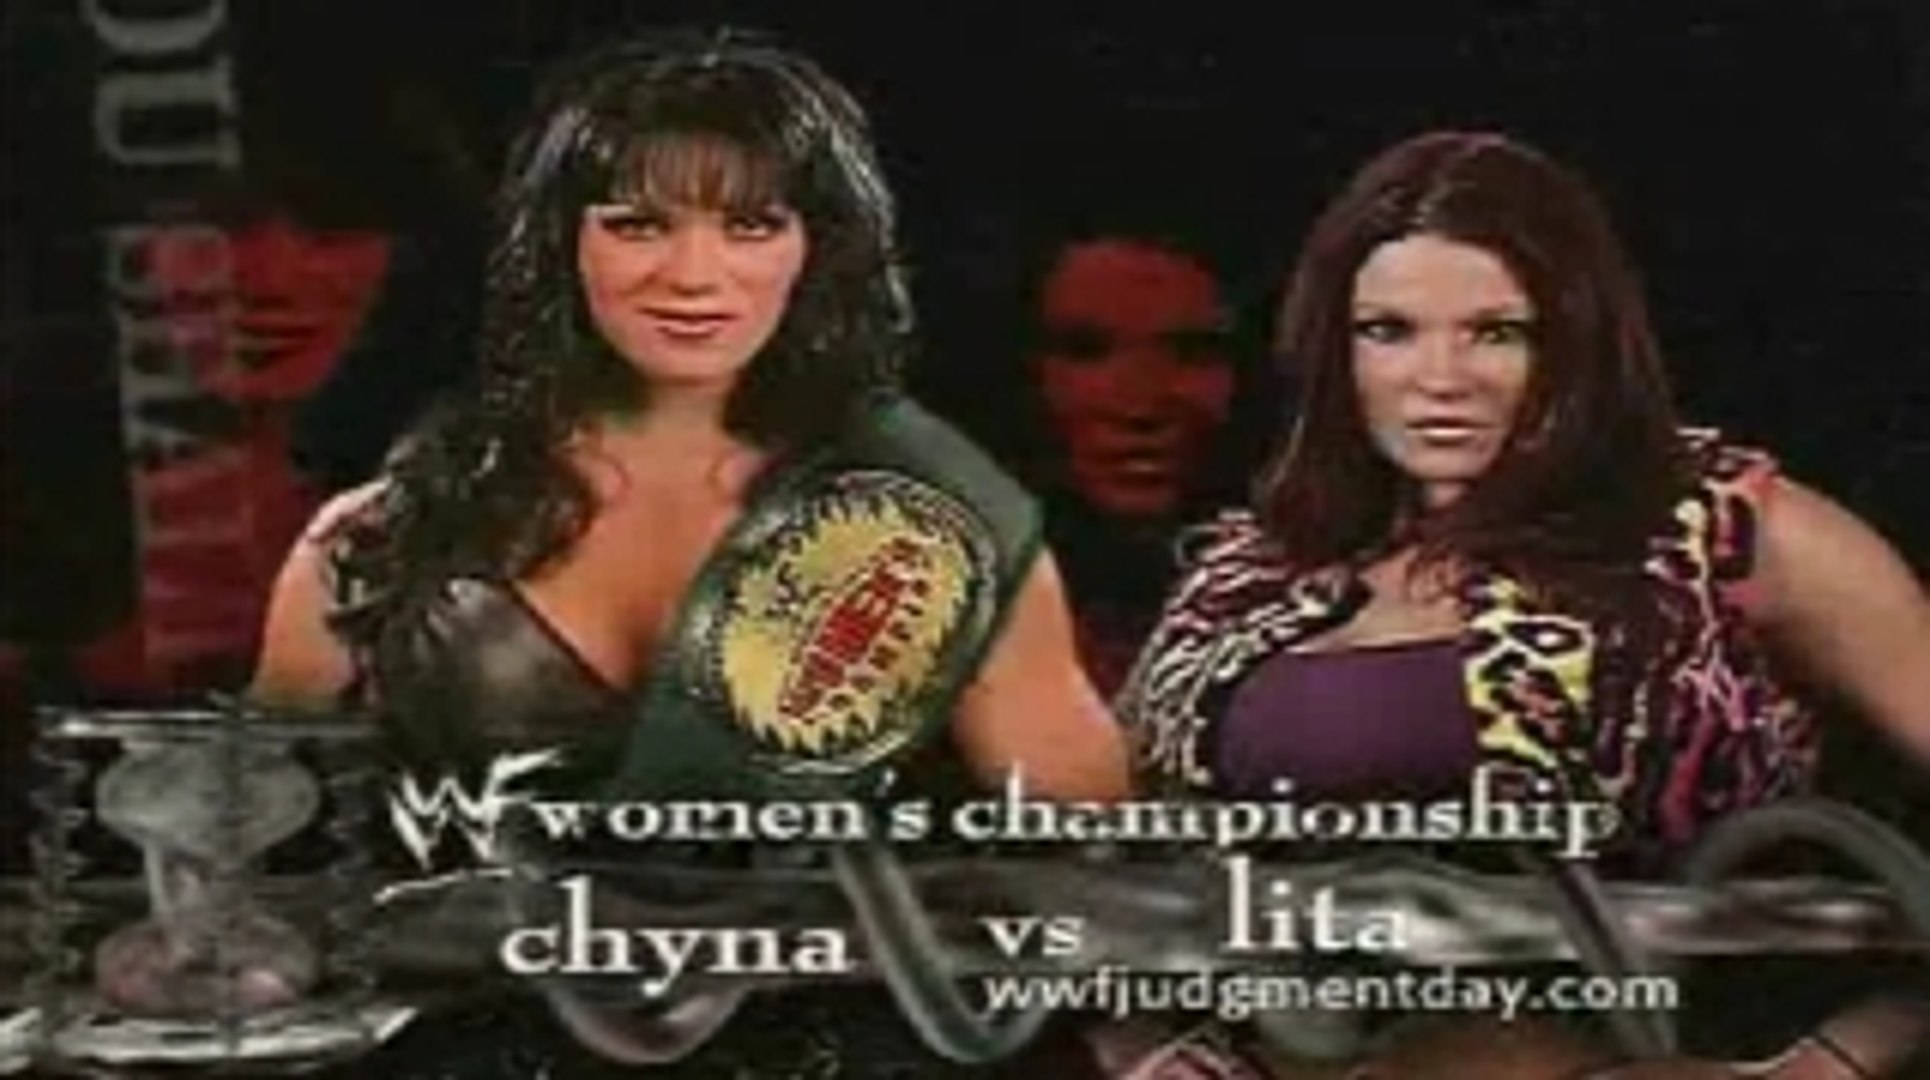 Chyna vs Lita WWF Women's Championship Judgement Day 2001 - 動画 Dailymotion